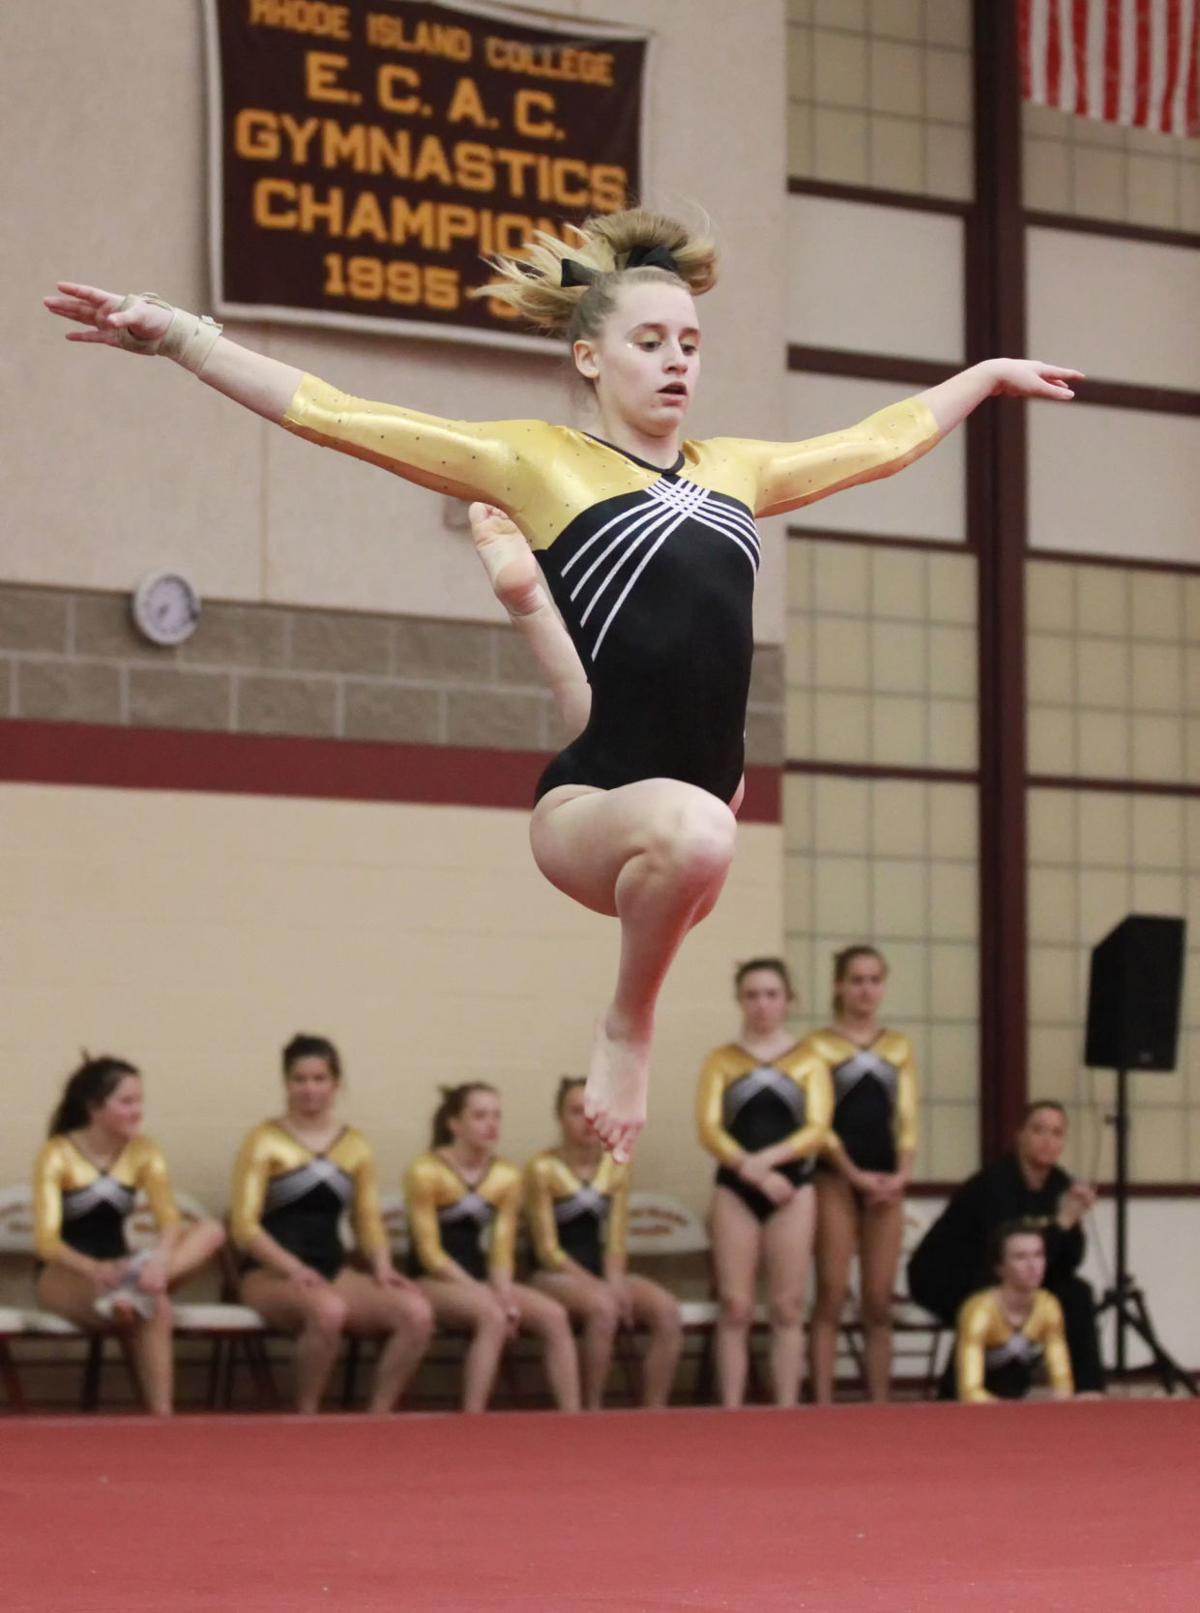 North Wins Second Consecutive Gymnastics Crown